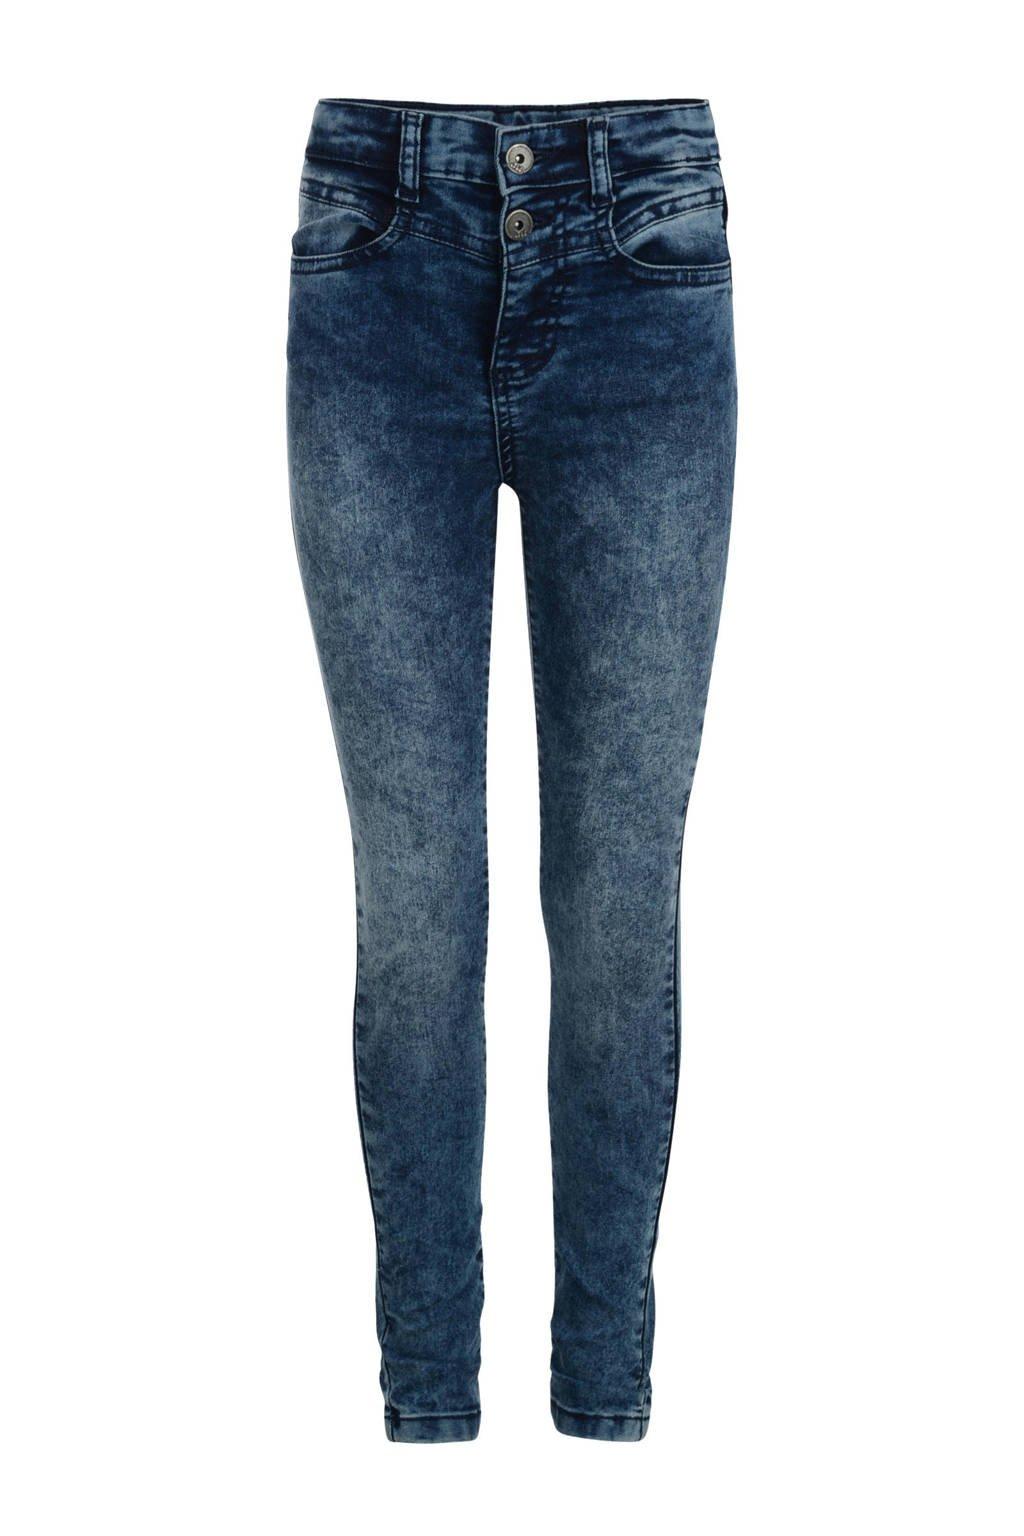 Jill & Mitch by Shoeby high waist slim fit jeans Chrissy midiumstone, MEDIUMSTONE